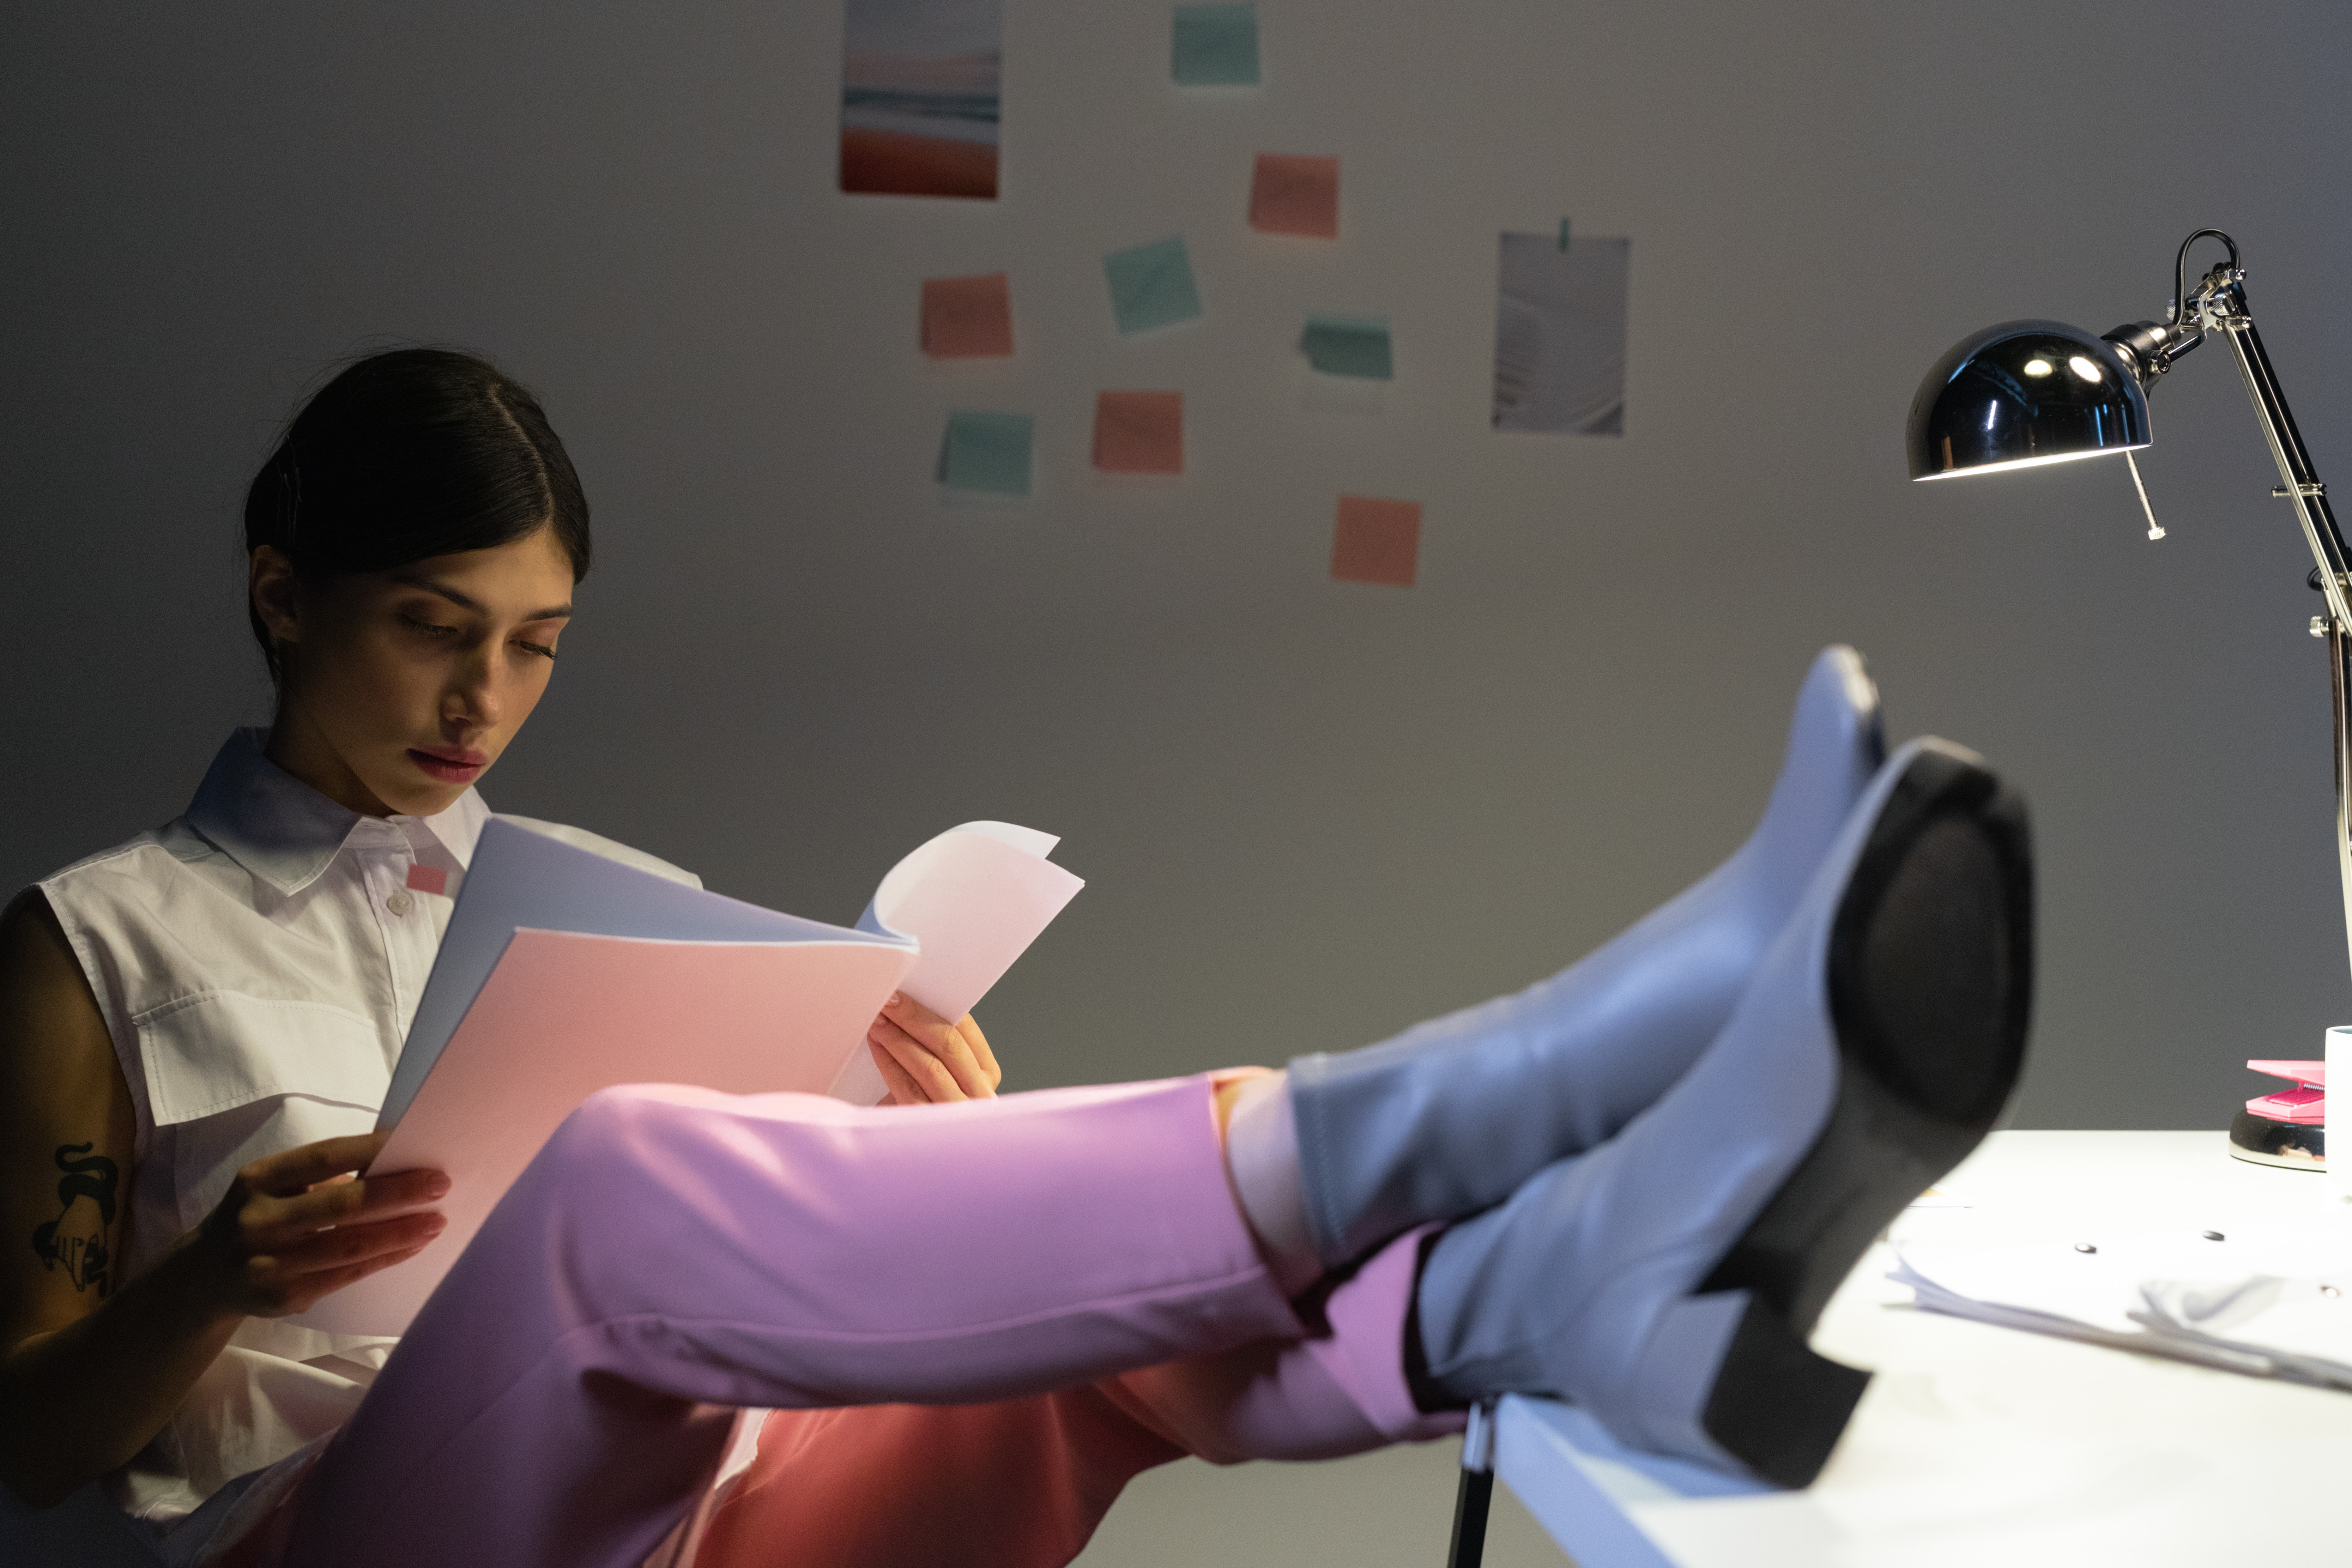 pexels cottonbro 9063381 - Stilfulde sko til arbejdspladsen